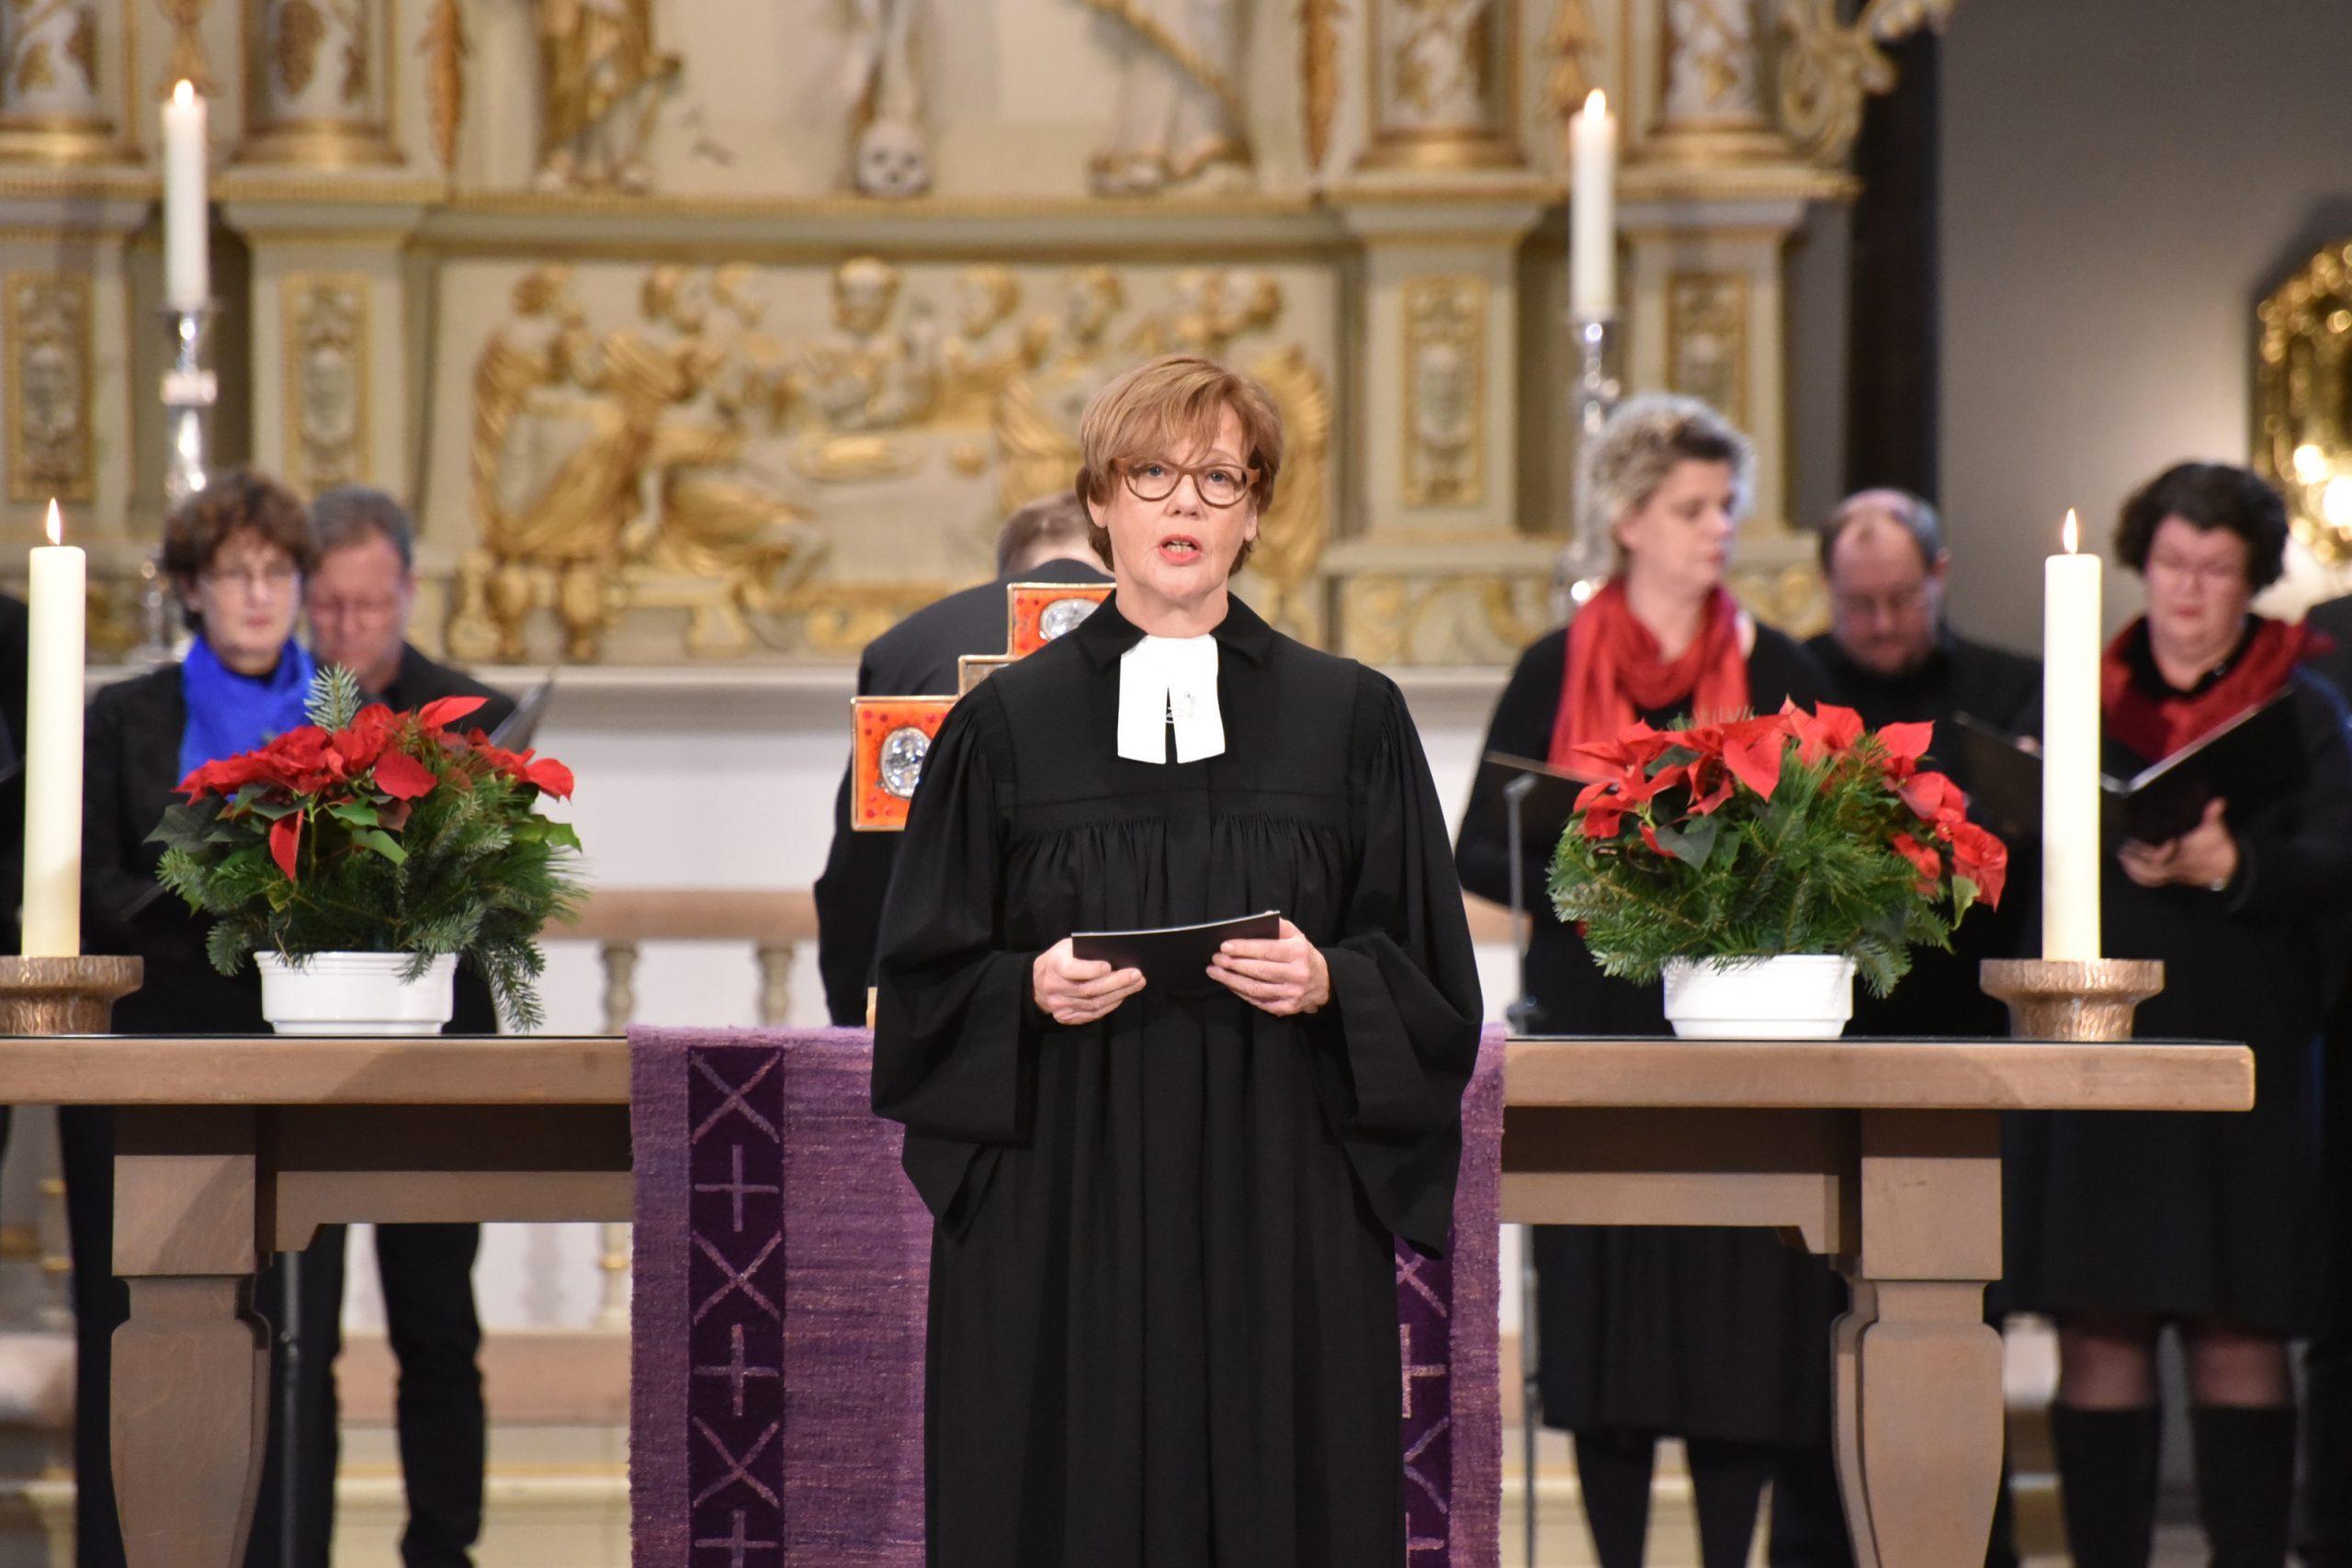 Cornelia Füllkrug-Weitzel Wird Honorarprofessorin